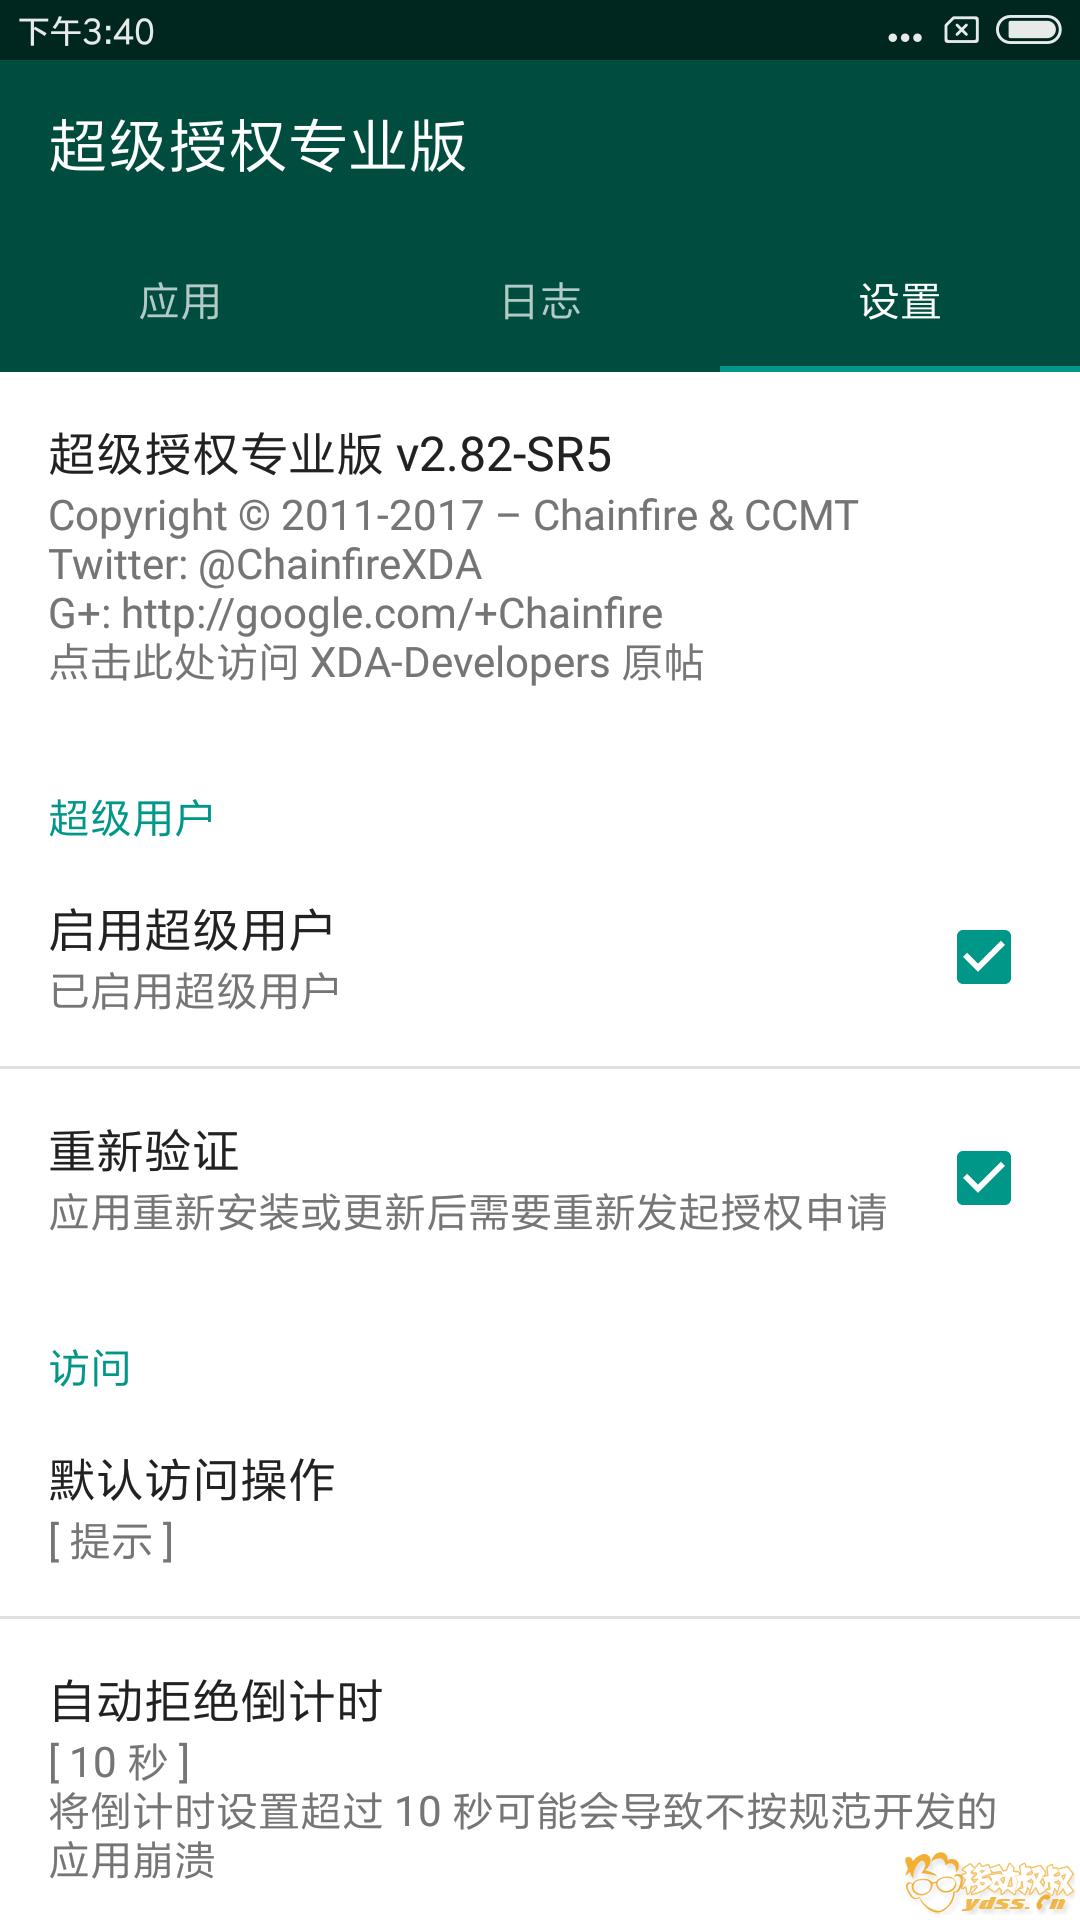 Screenshot_2018-07-06-15-40-24-574_eu.chainfire.supersu.png